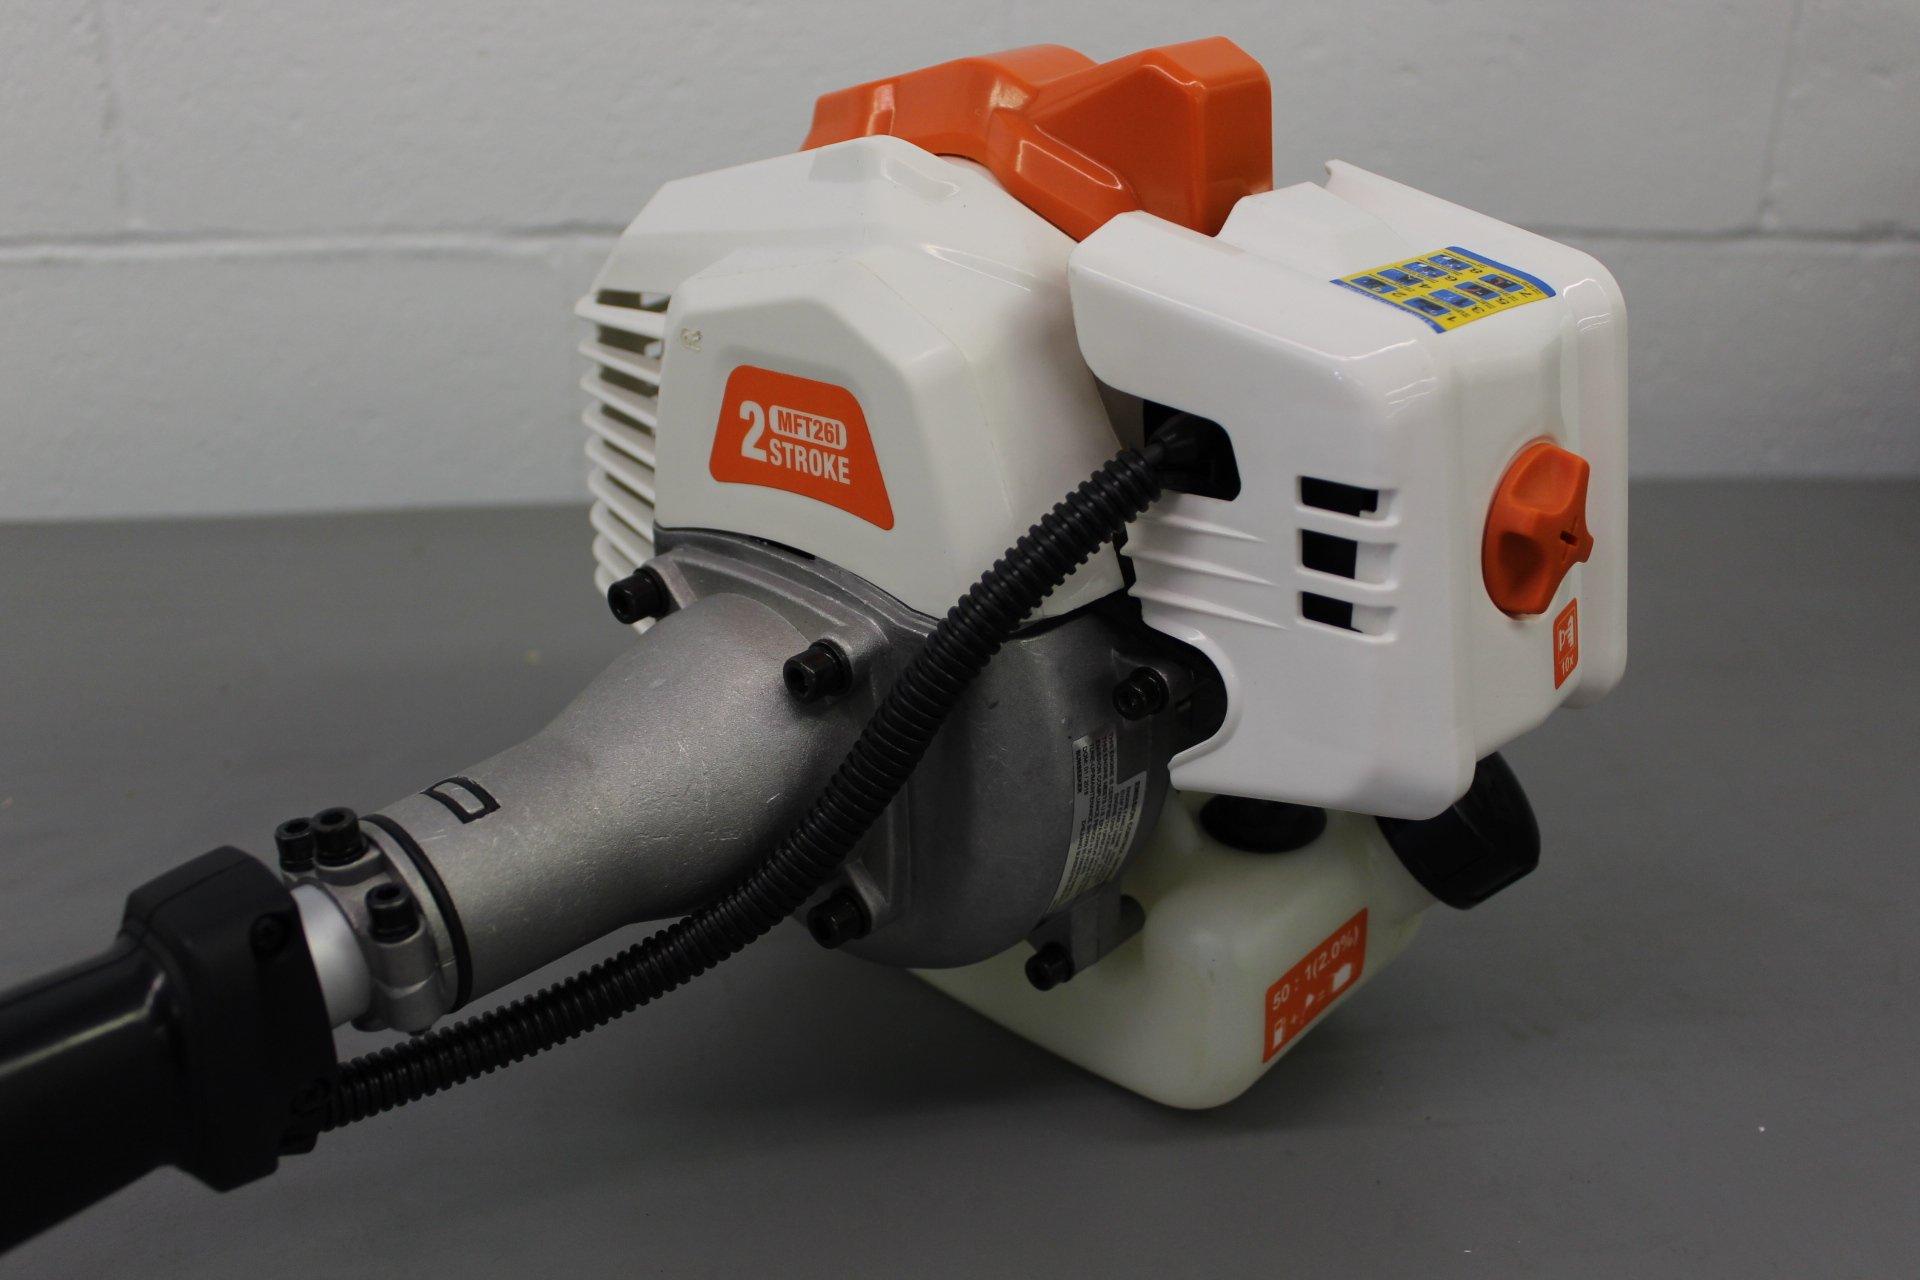 MFT26-PH-SQ: PH - MFT26 Power Head - Square Connector - BCI26 & MFT26